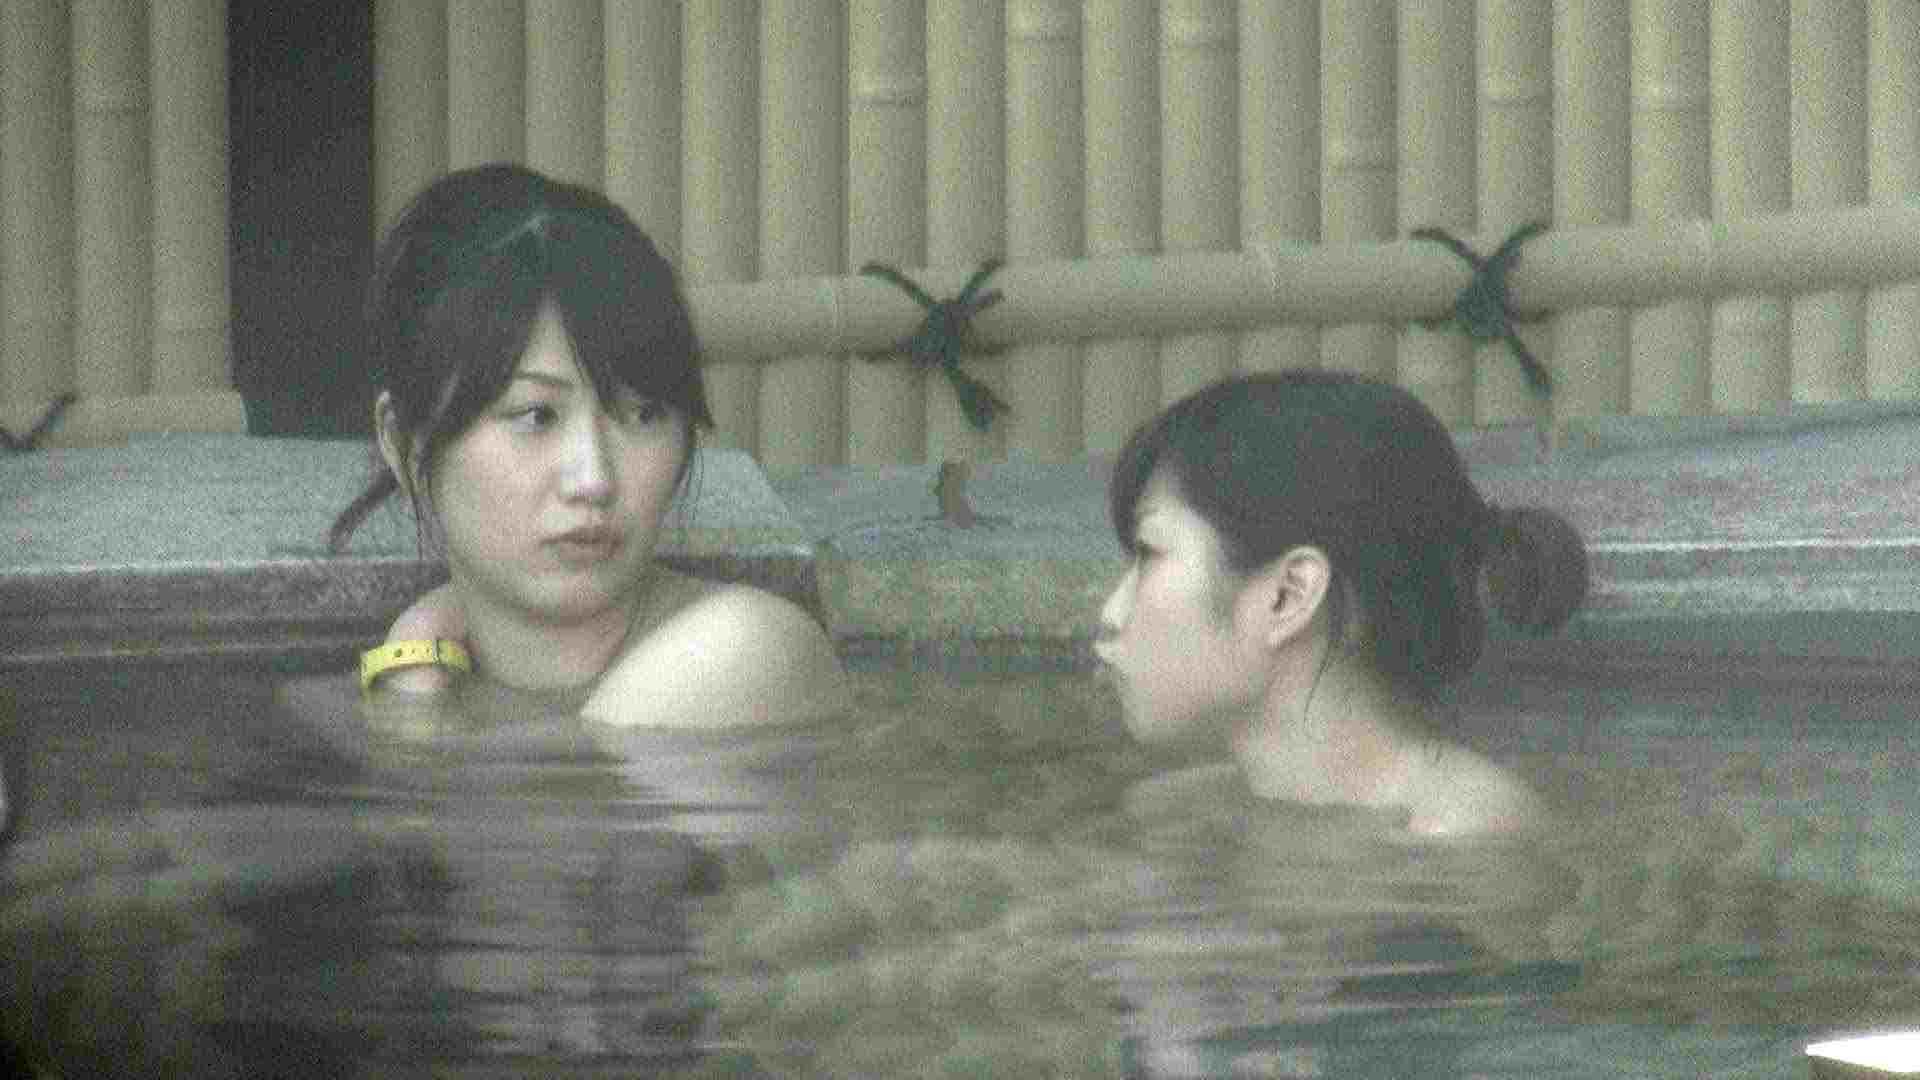 Aquaな露天風呂Vol.206 露天 エロ画像 59連発 3